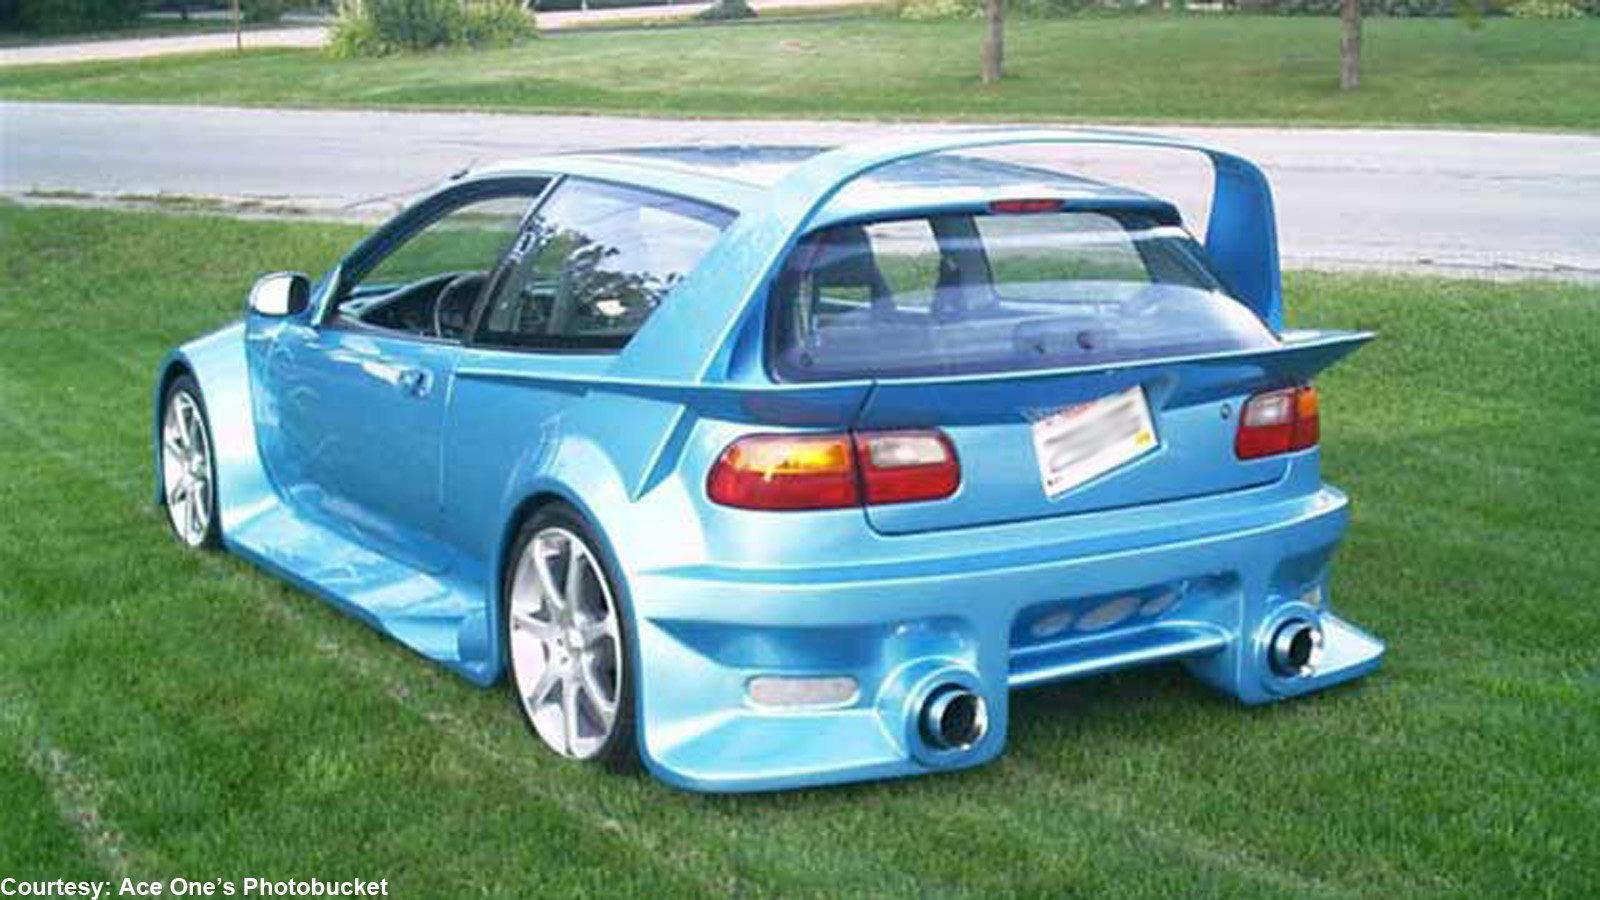 Acura Zdx For Sale >> 5 Regrettable Honda Civic Mods | Honda-tech